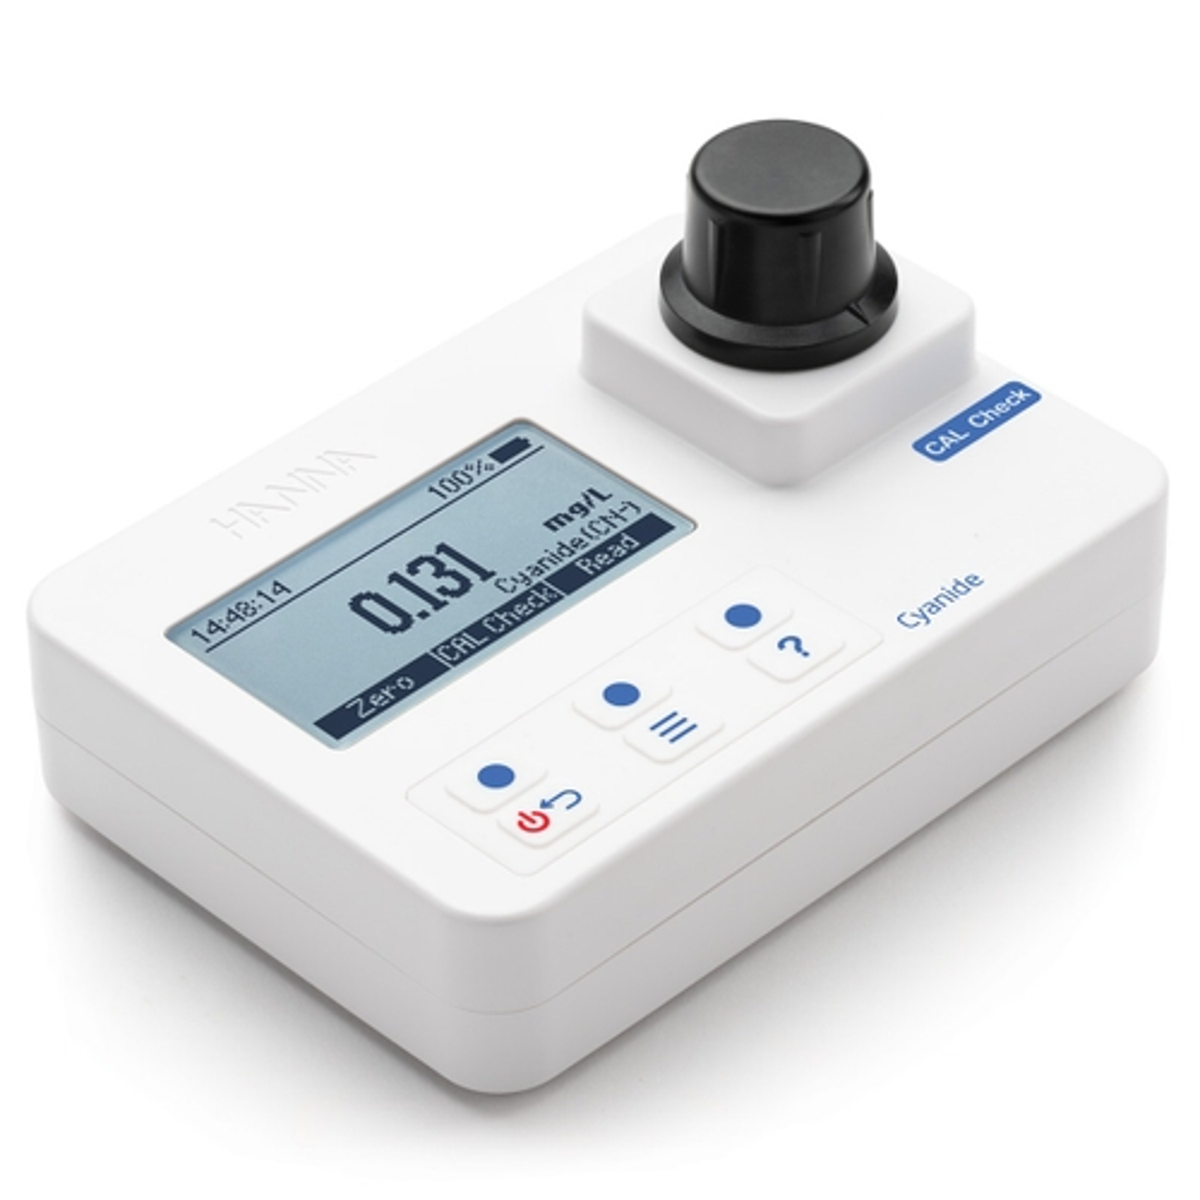 HI97714 Cyanide Portable Photometer with CAL Check